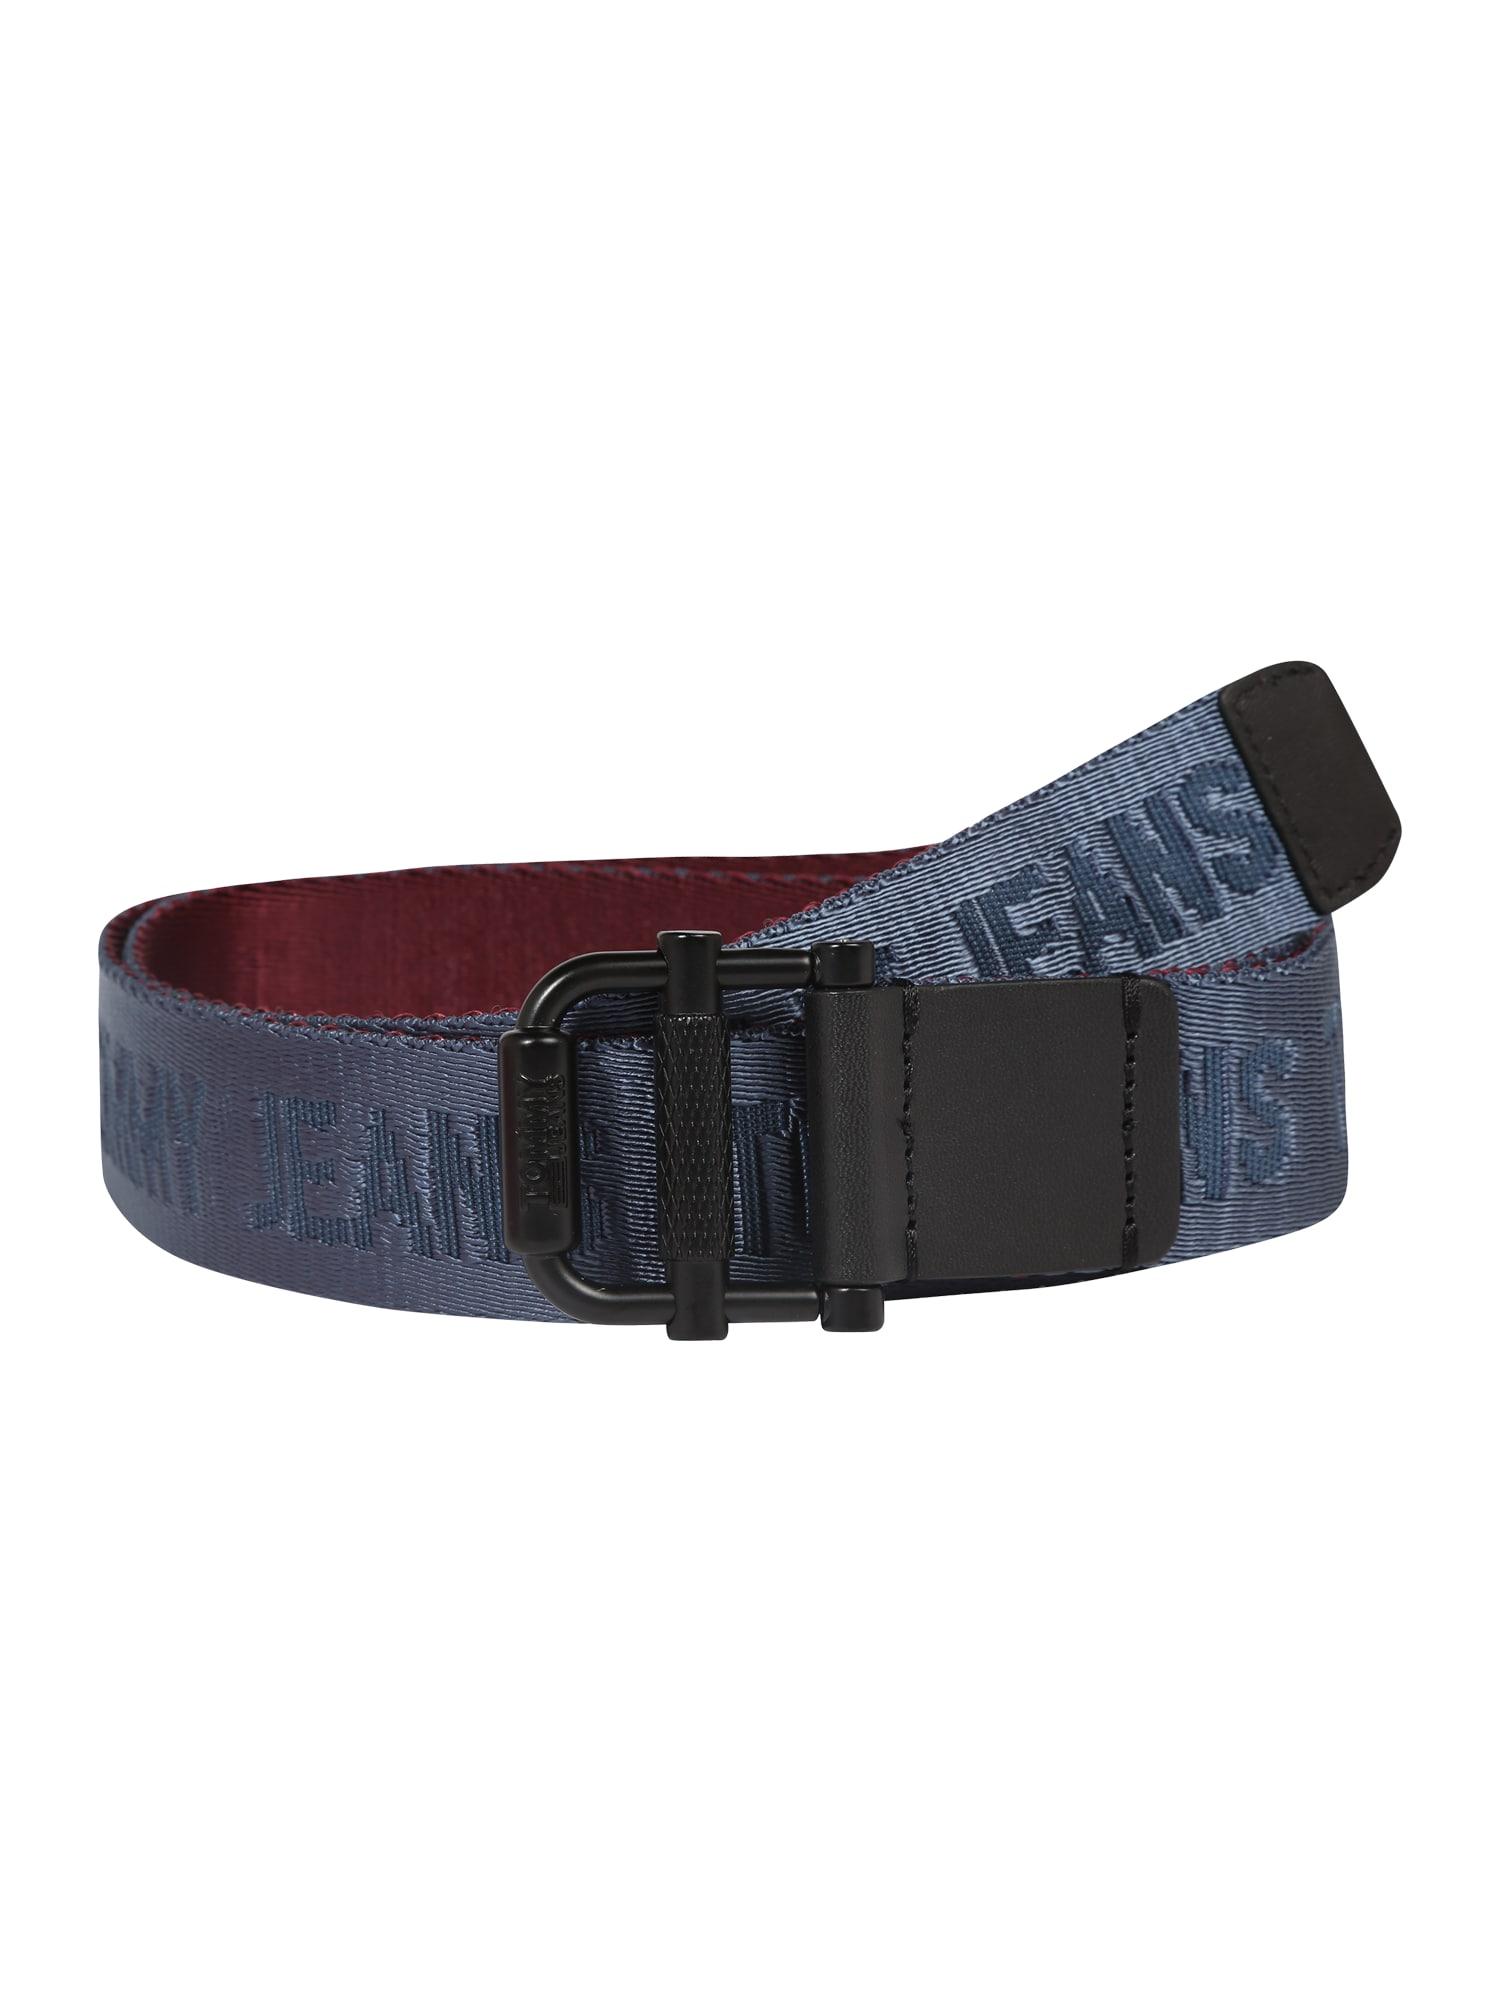 Opasek TJM ROLLER REV WEBBING BELT 3.5 tmavě modrá bordó Tommy Jeans